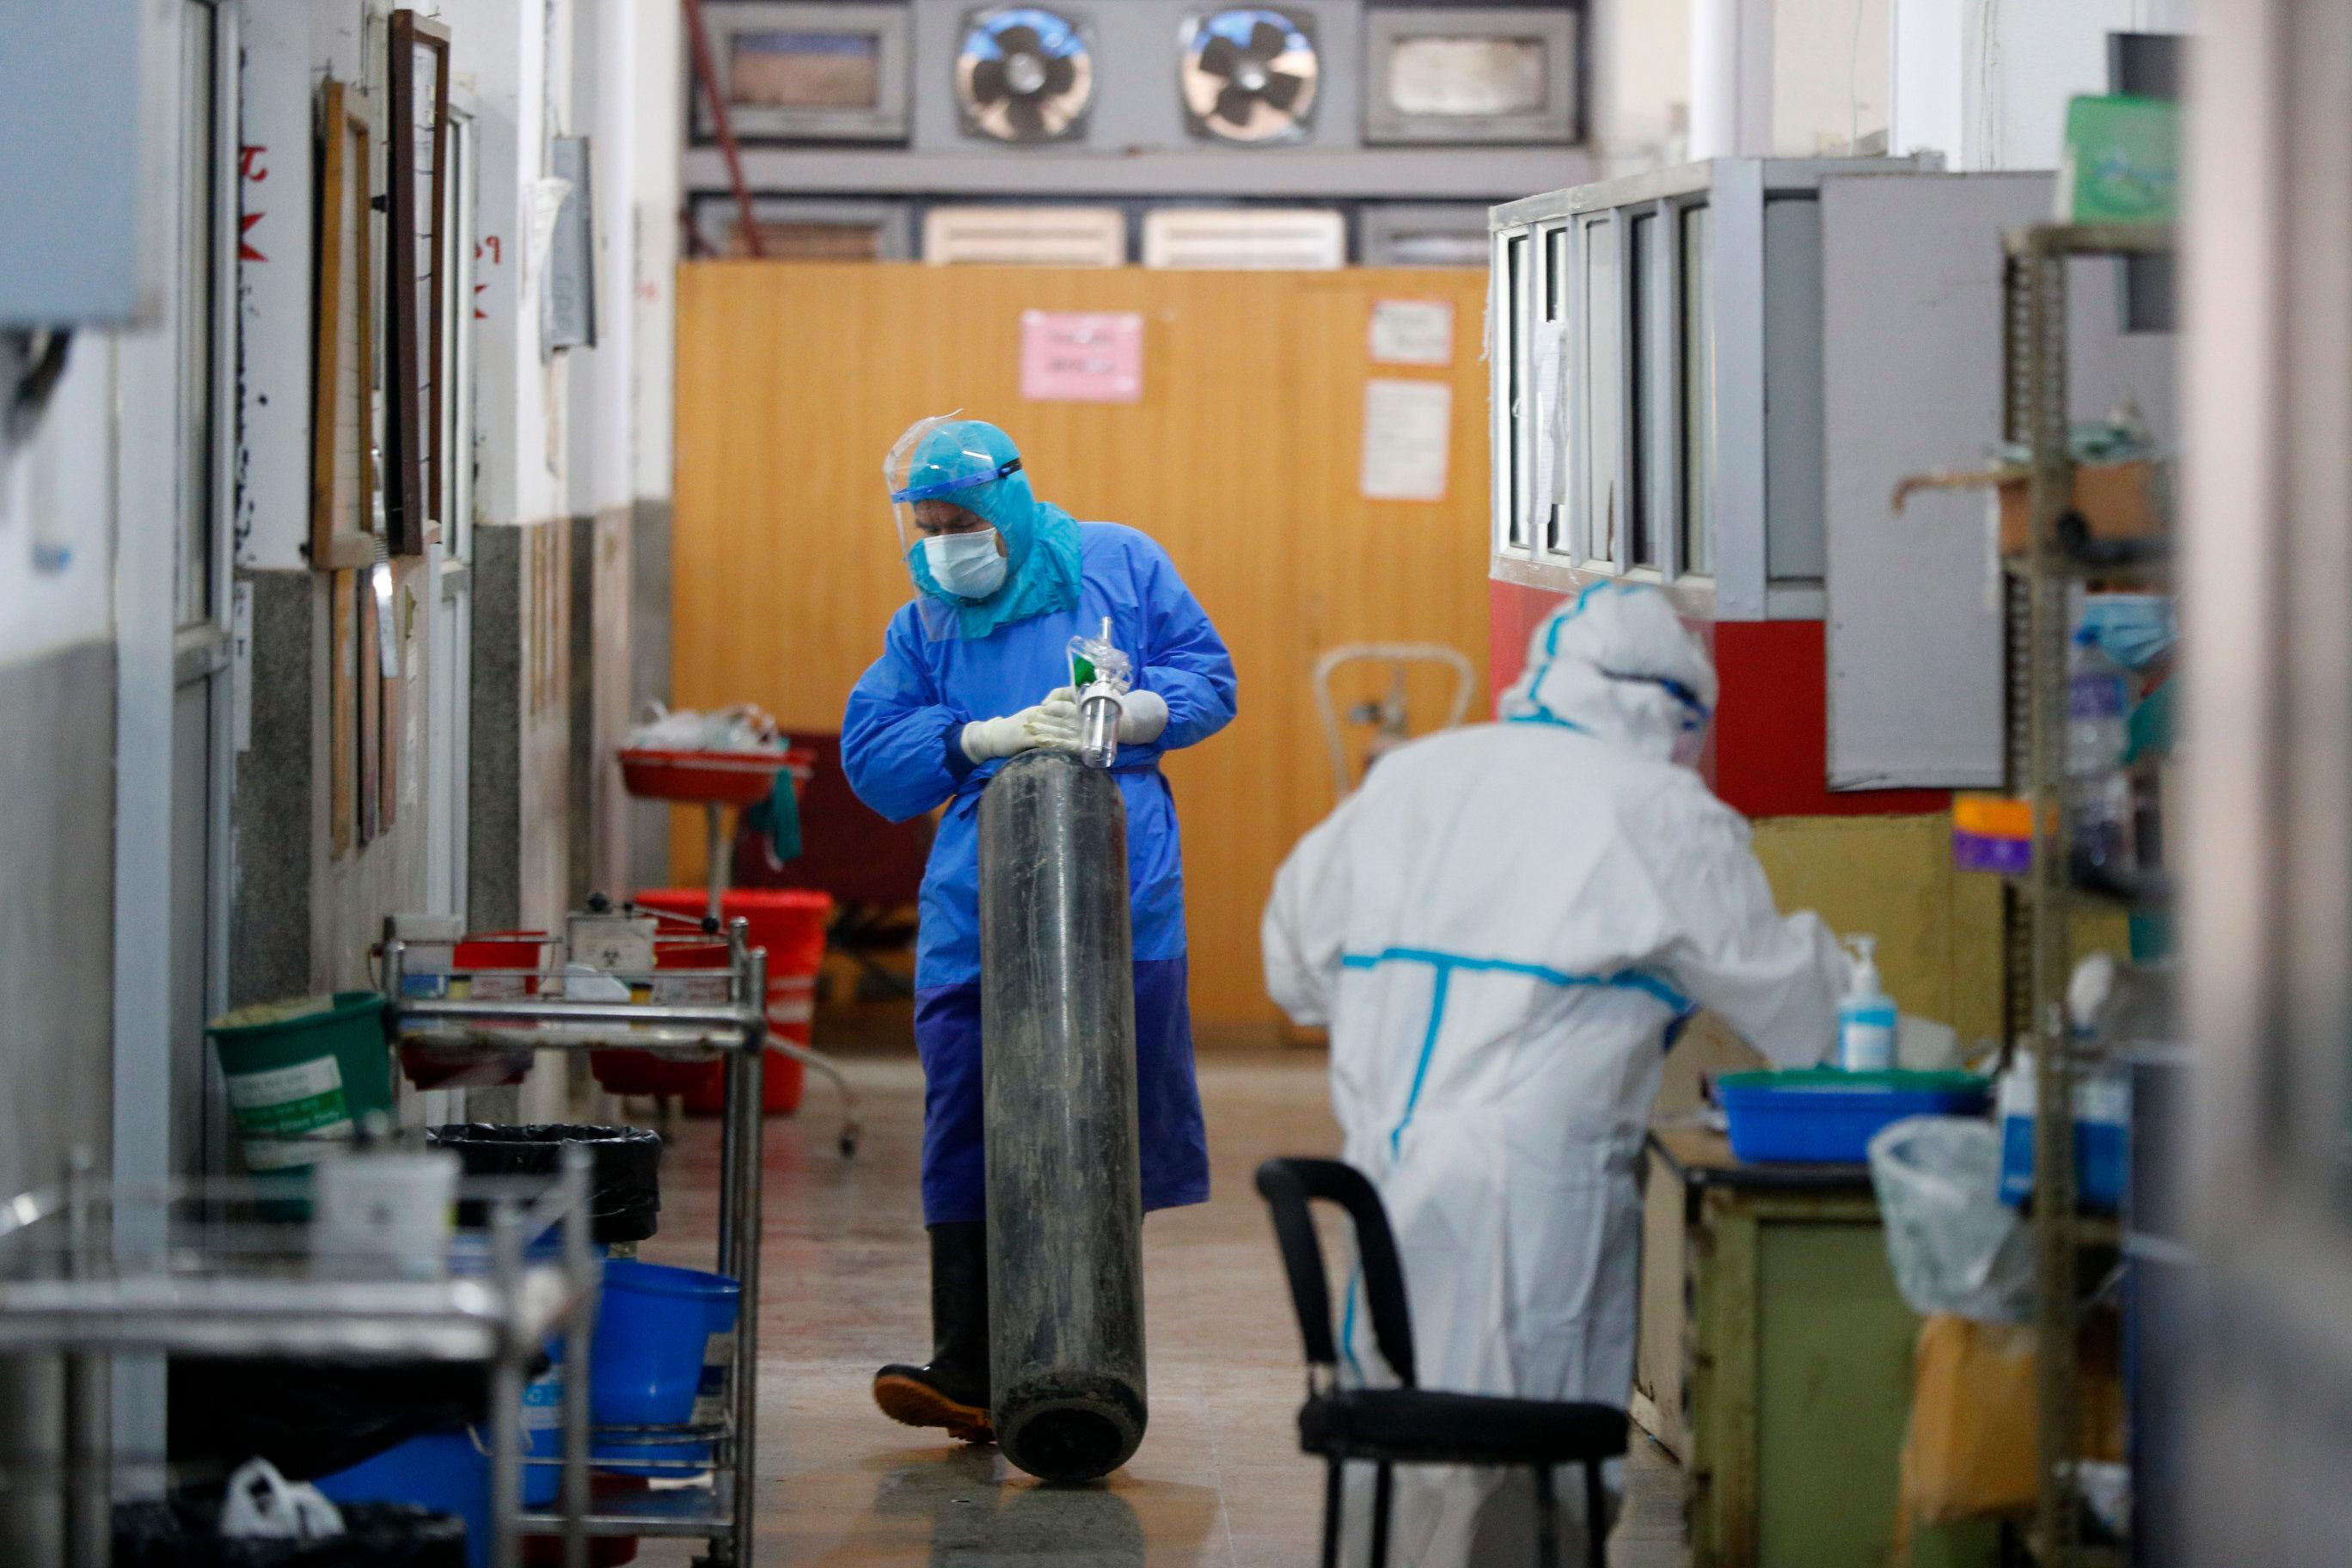 A health worker holds an oxygen cylinder inside a Covid-19 hospital ward in Kathmandu, Nepal, on April 26.